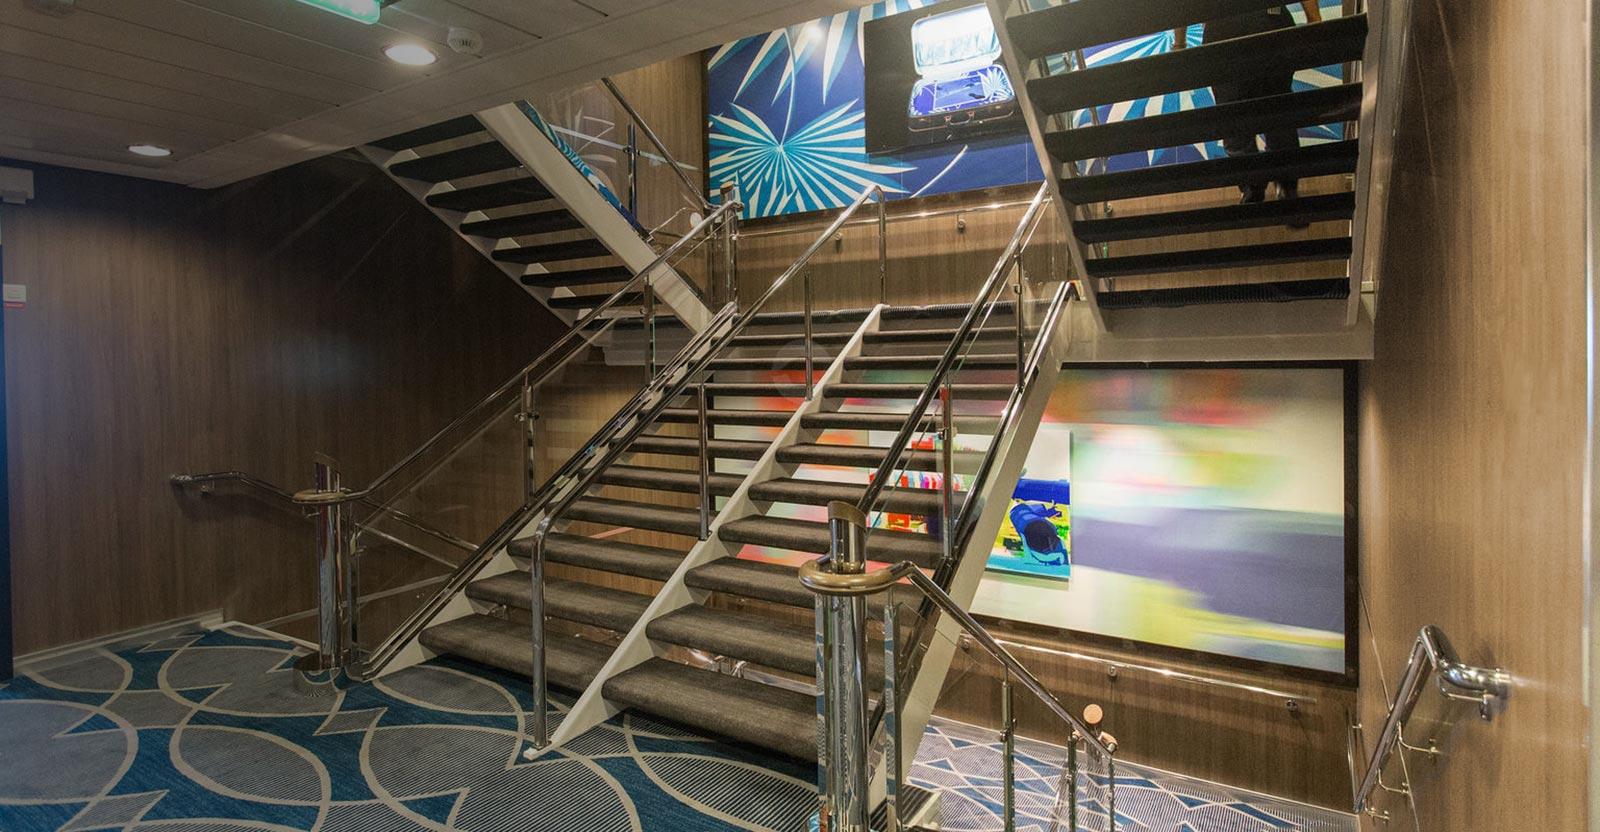 Escalier paquebot en sublimation